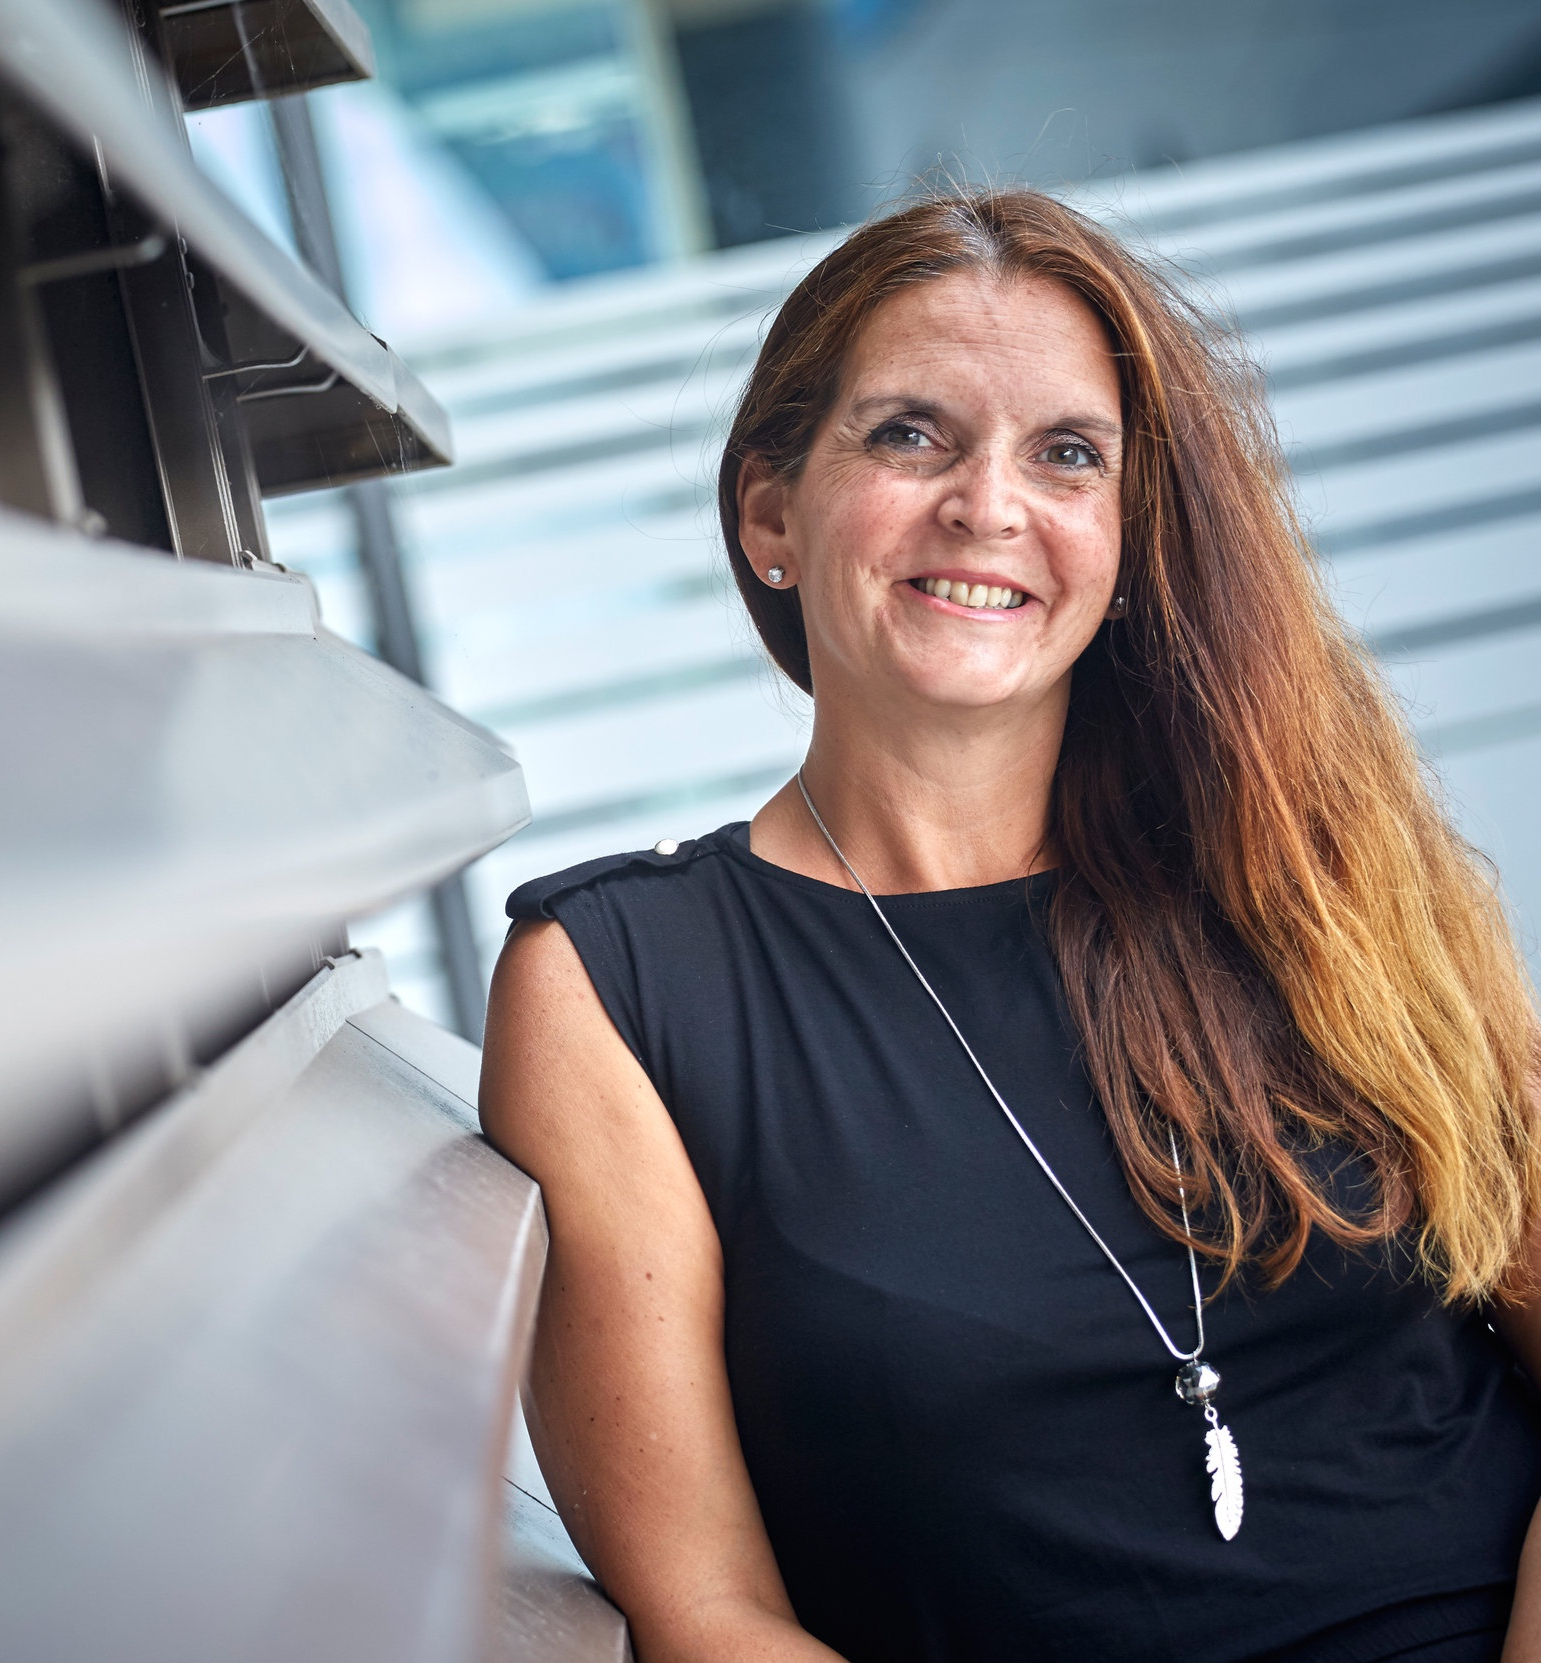 Moodbeam Founder - Christina Colmer McHugh